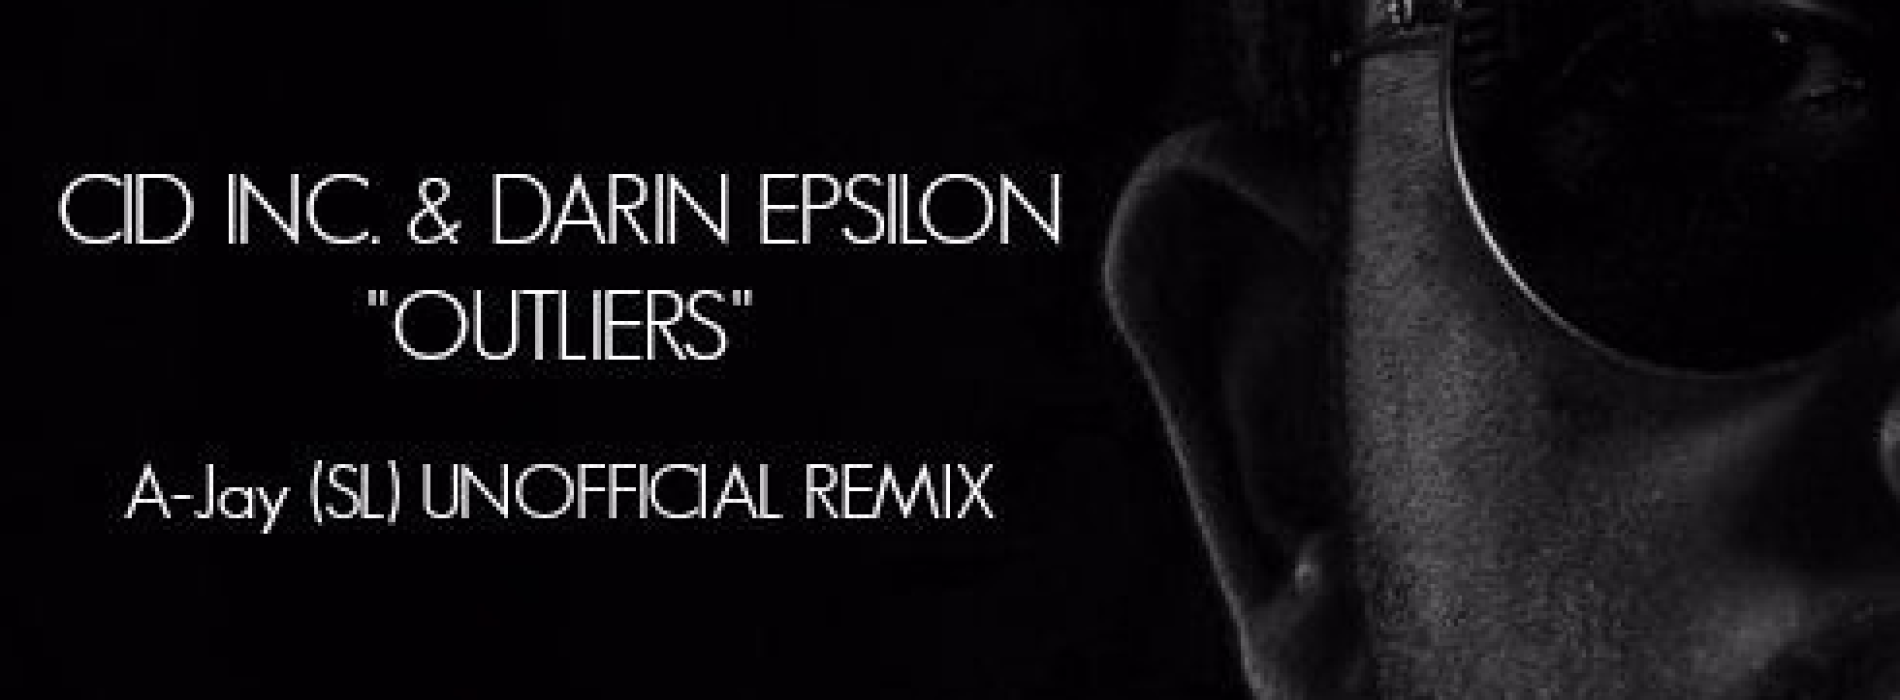 A-Jay : Cid Inc. & Darin Epsilon – Outliers (Unofficial Remix)